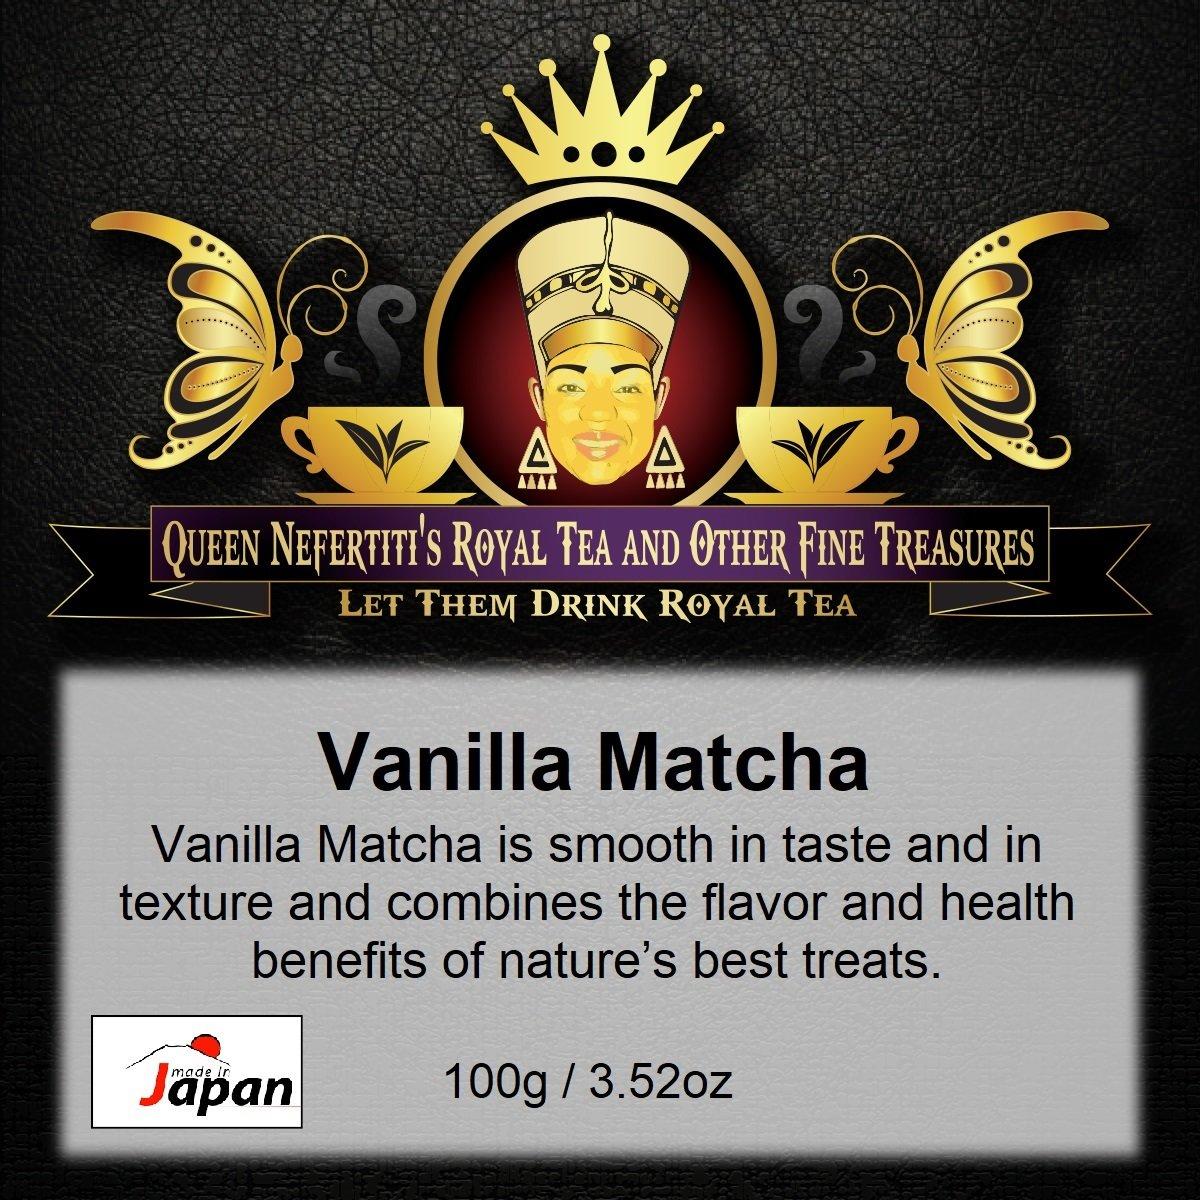 VANILLA MATCHA 100G